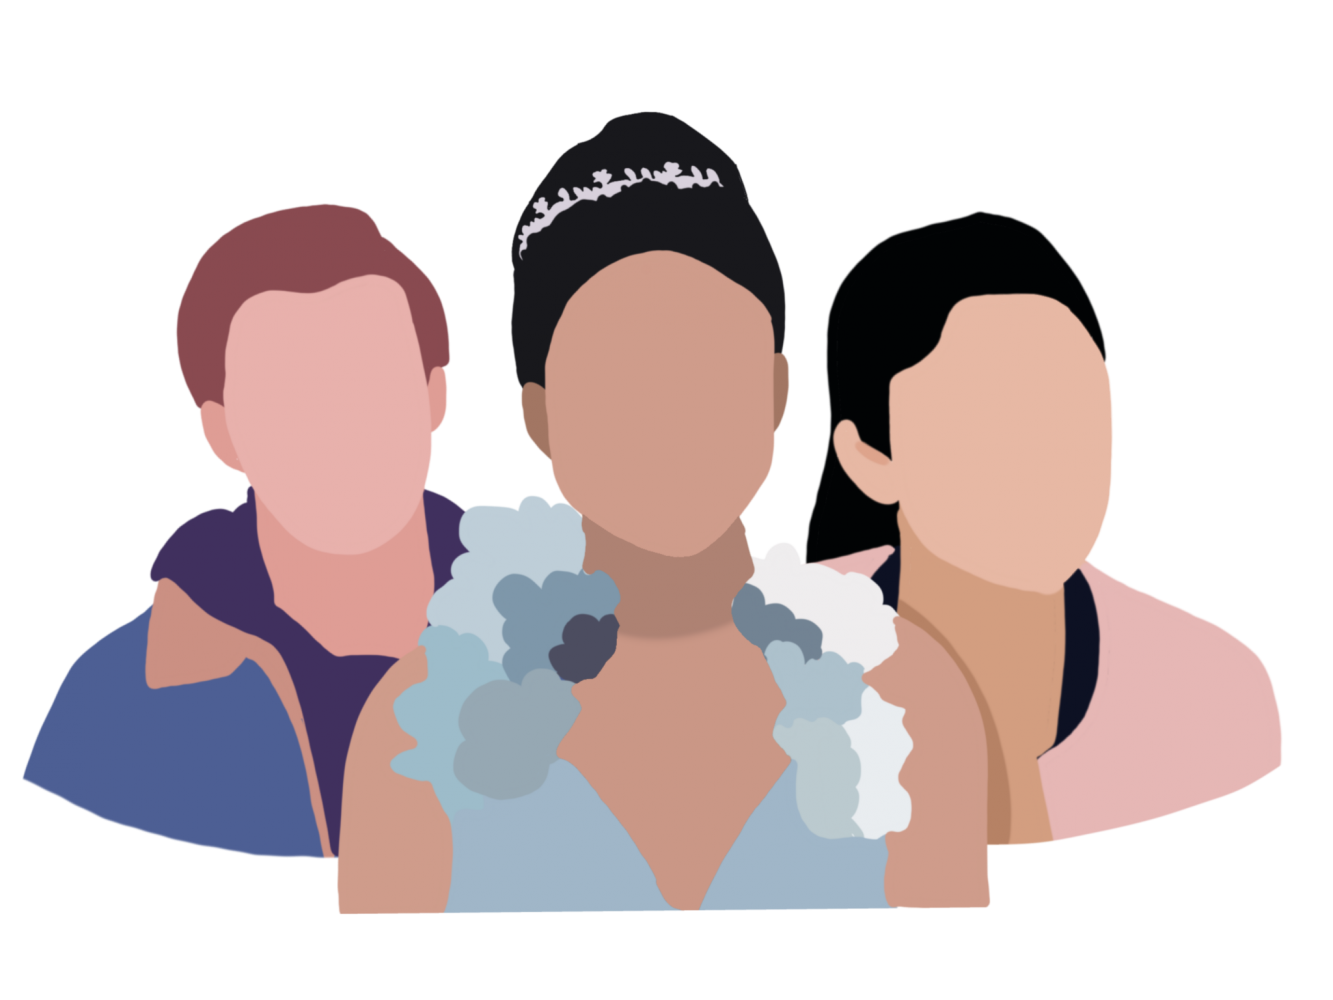 Minority students appreciate increase in diverse casts